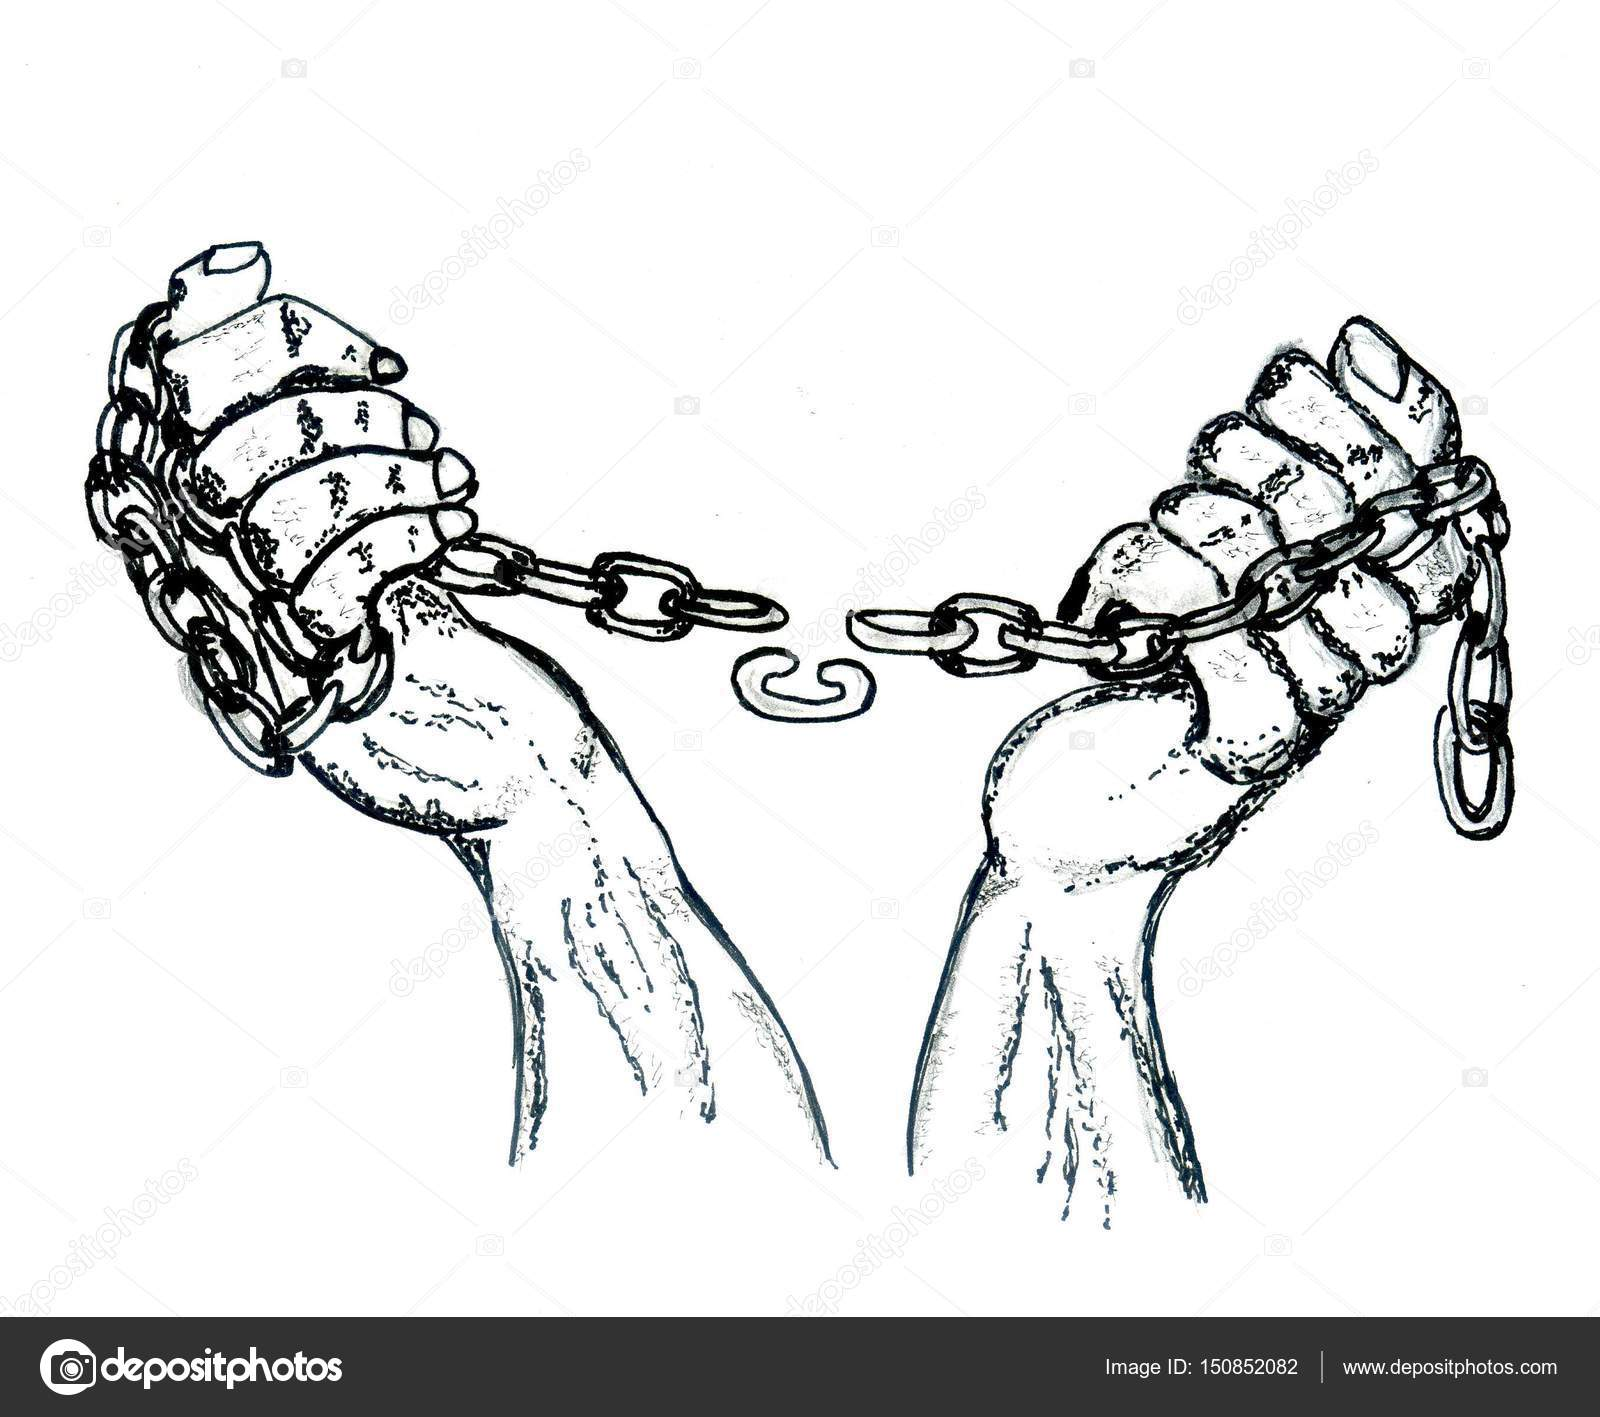 1600x1417 Hands In Chains Sketch Stock Photo Artshock